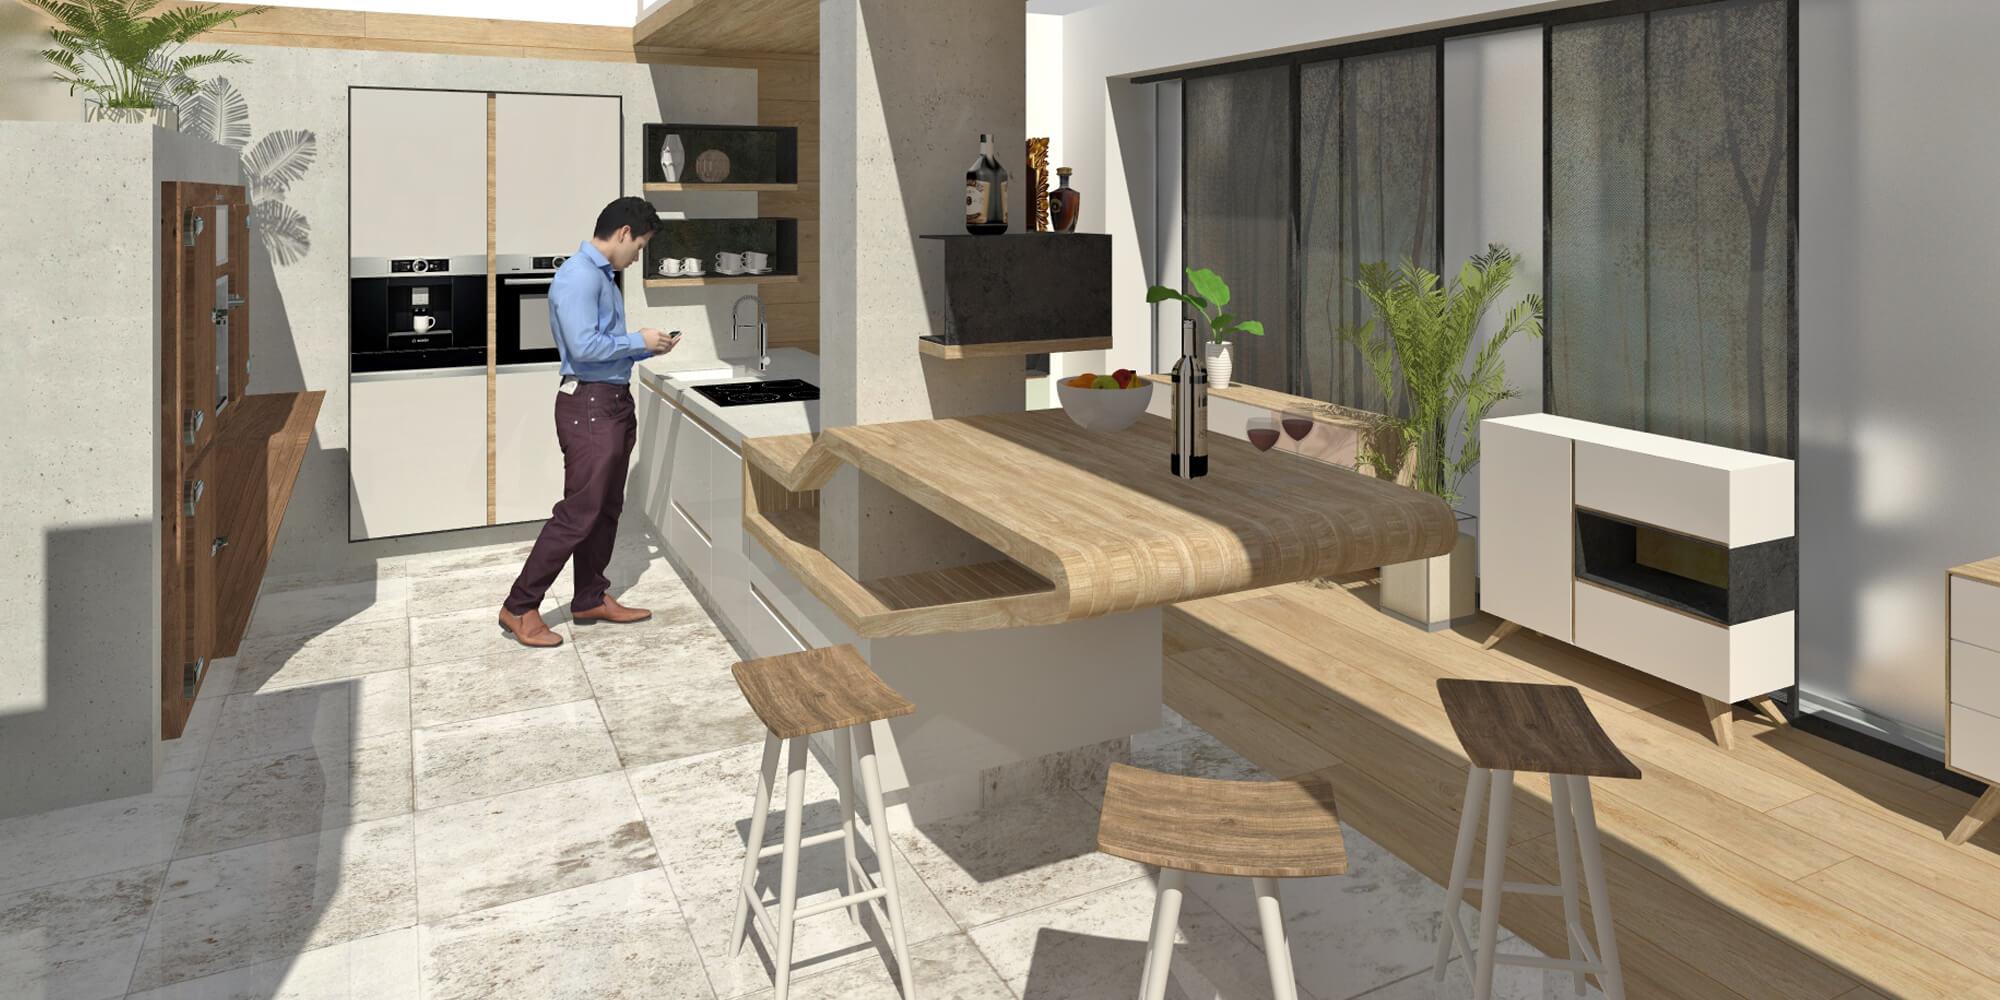 Cre-Plan-Design-Architektur-Innenarchitektur-Design-Referenz-Andexlinger-03